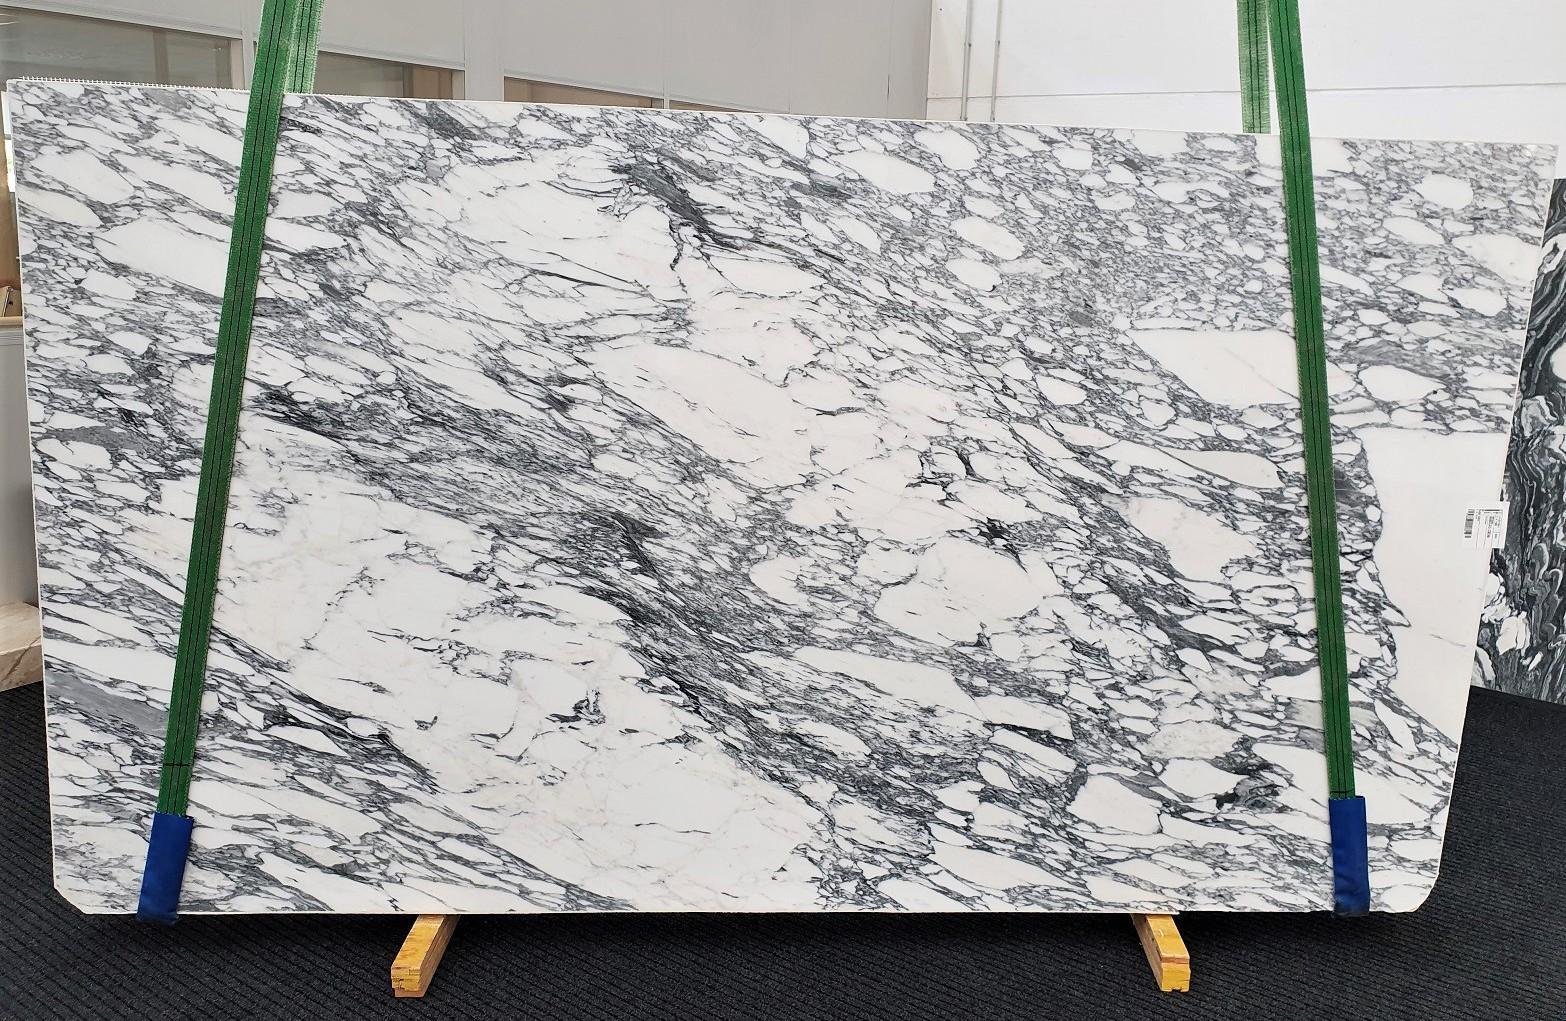 ARABESCATO CORCHIA Supply Veneto (Italy) polished slabs 1420 , Slab #53 natural marble